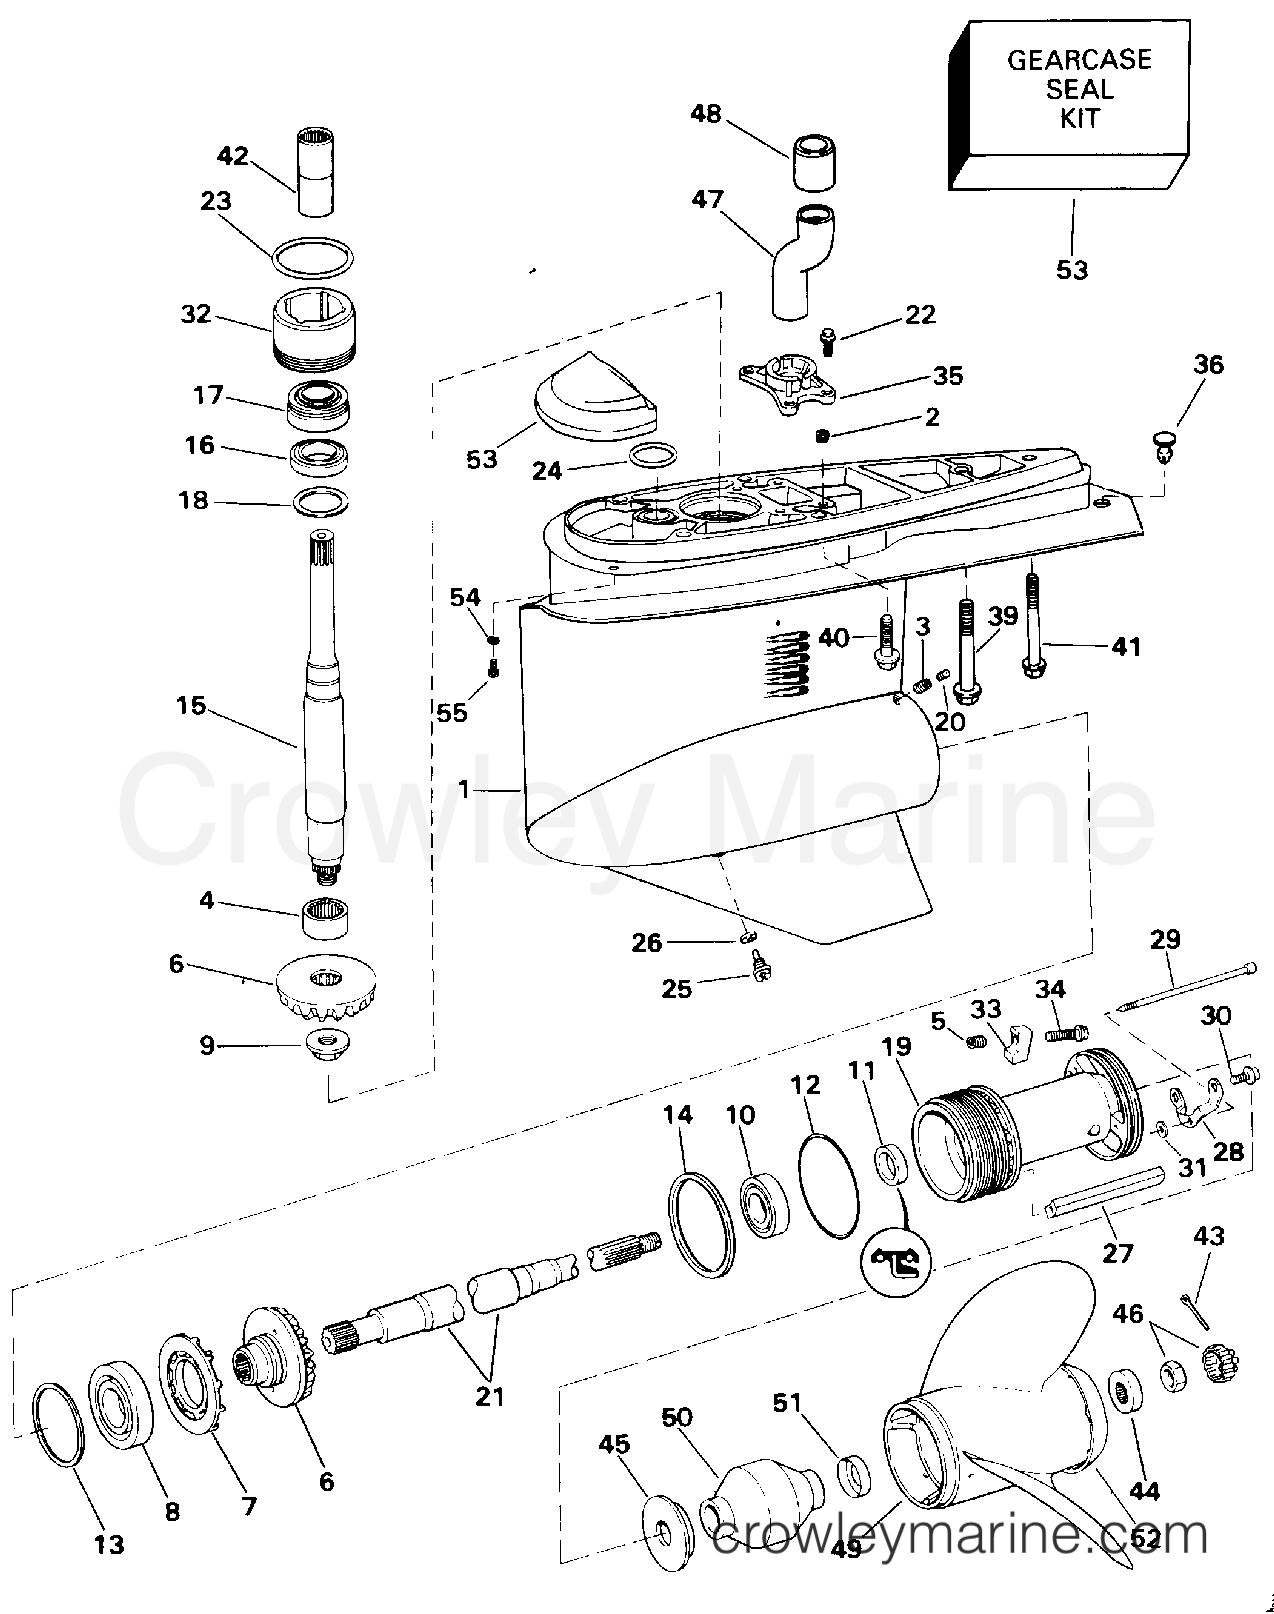 1994 OMC Stern Drive 5.8 - 58FAGPMDM - LOWER GEARCASE